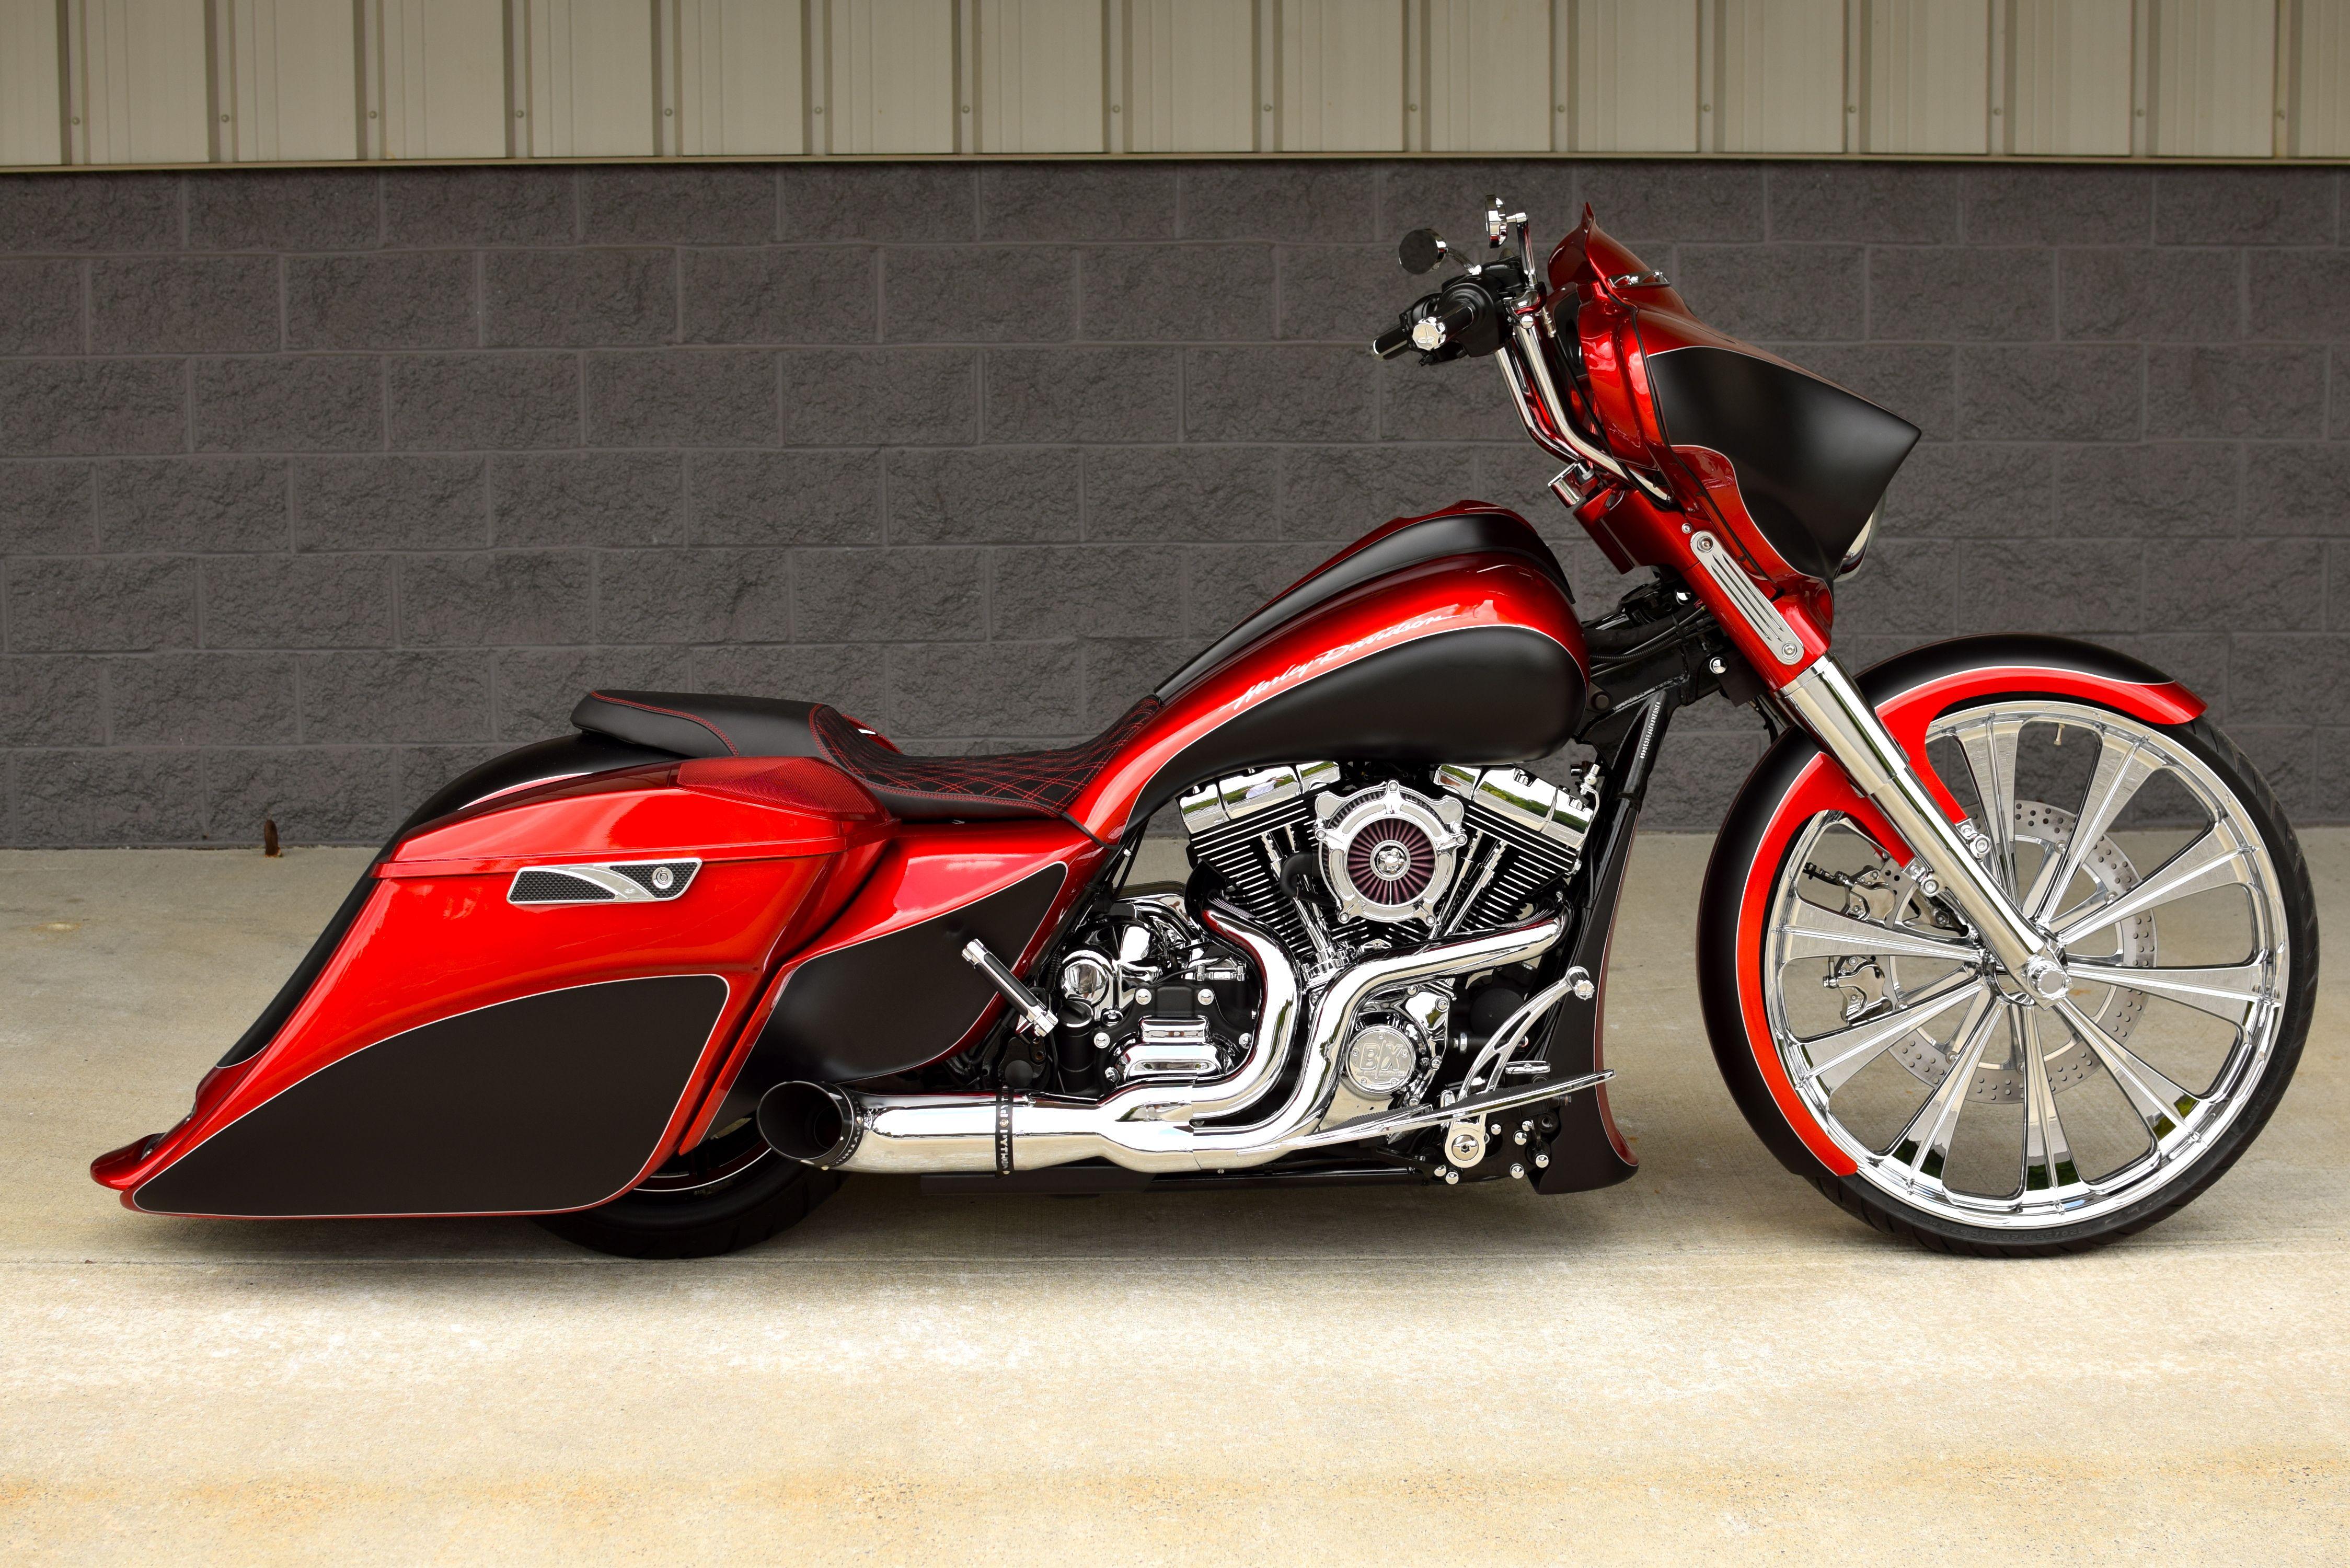 2017 Harley Davidson Street Glide Special 26 Wheel Custom Bagger 23 The Bike Exchange